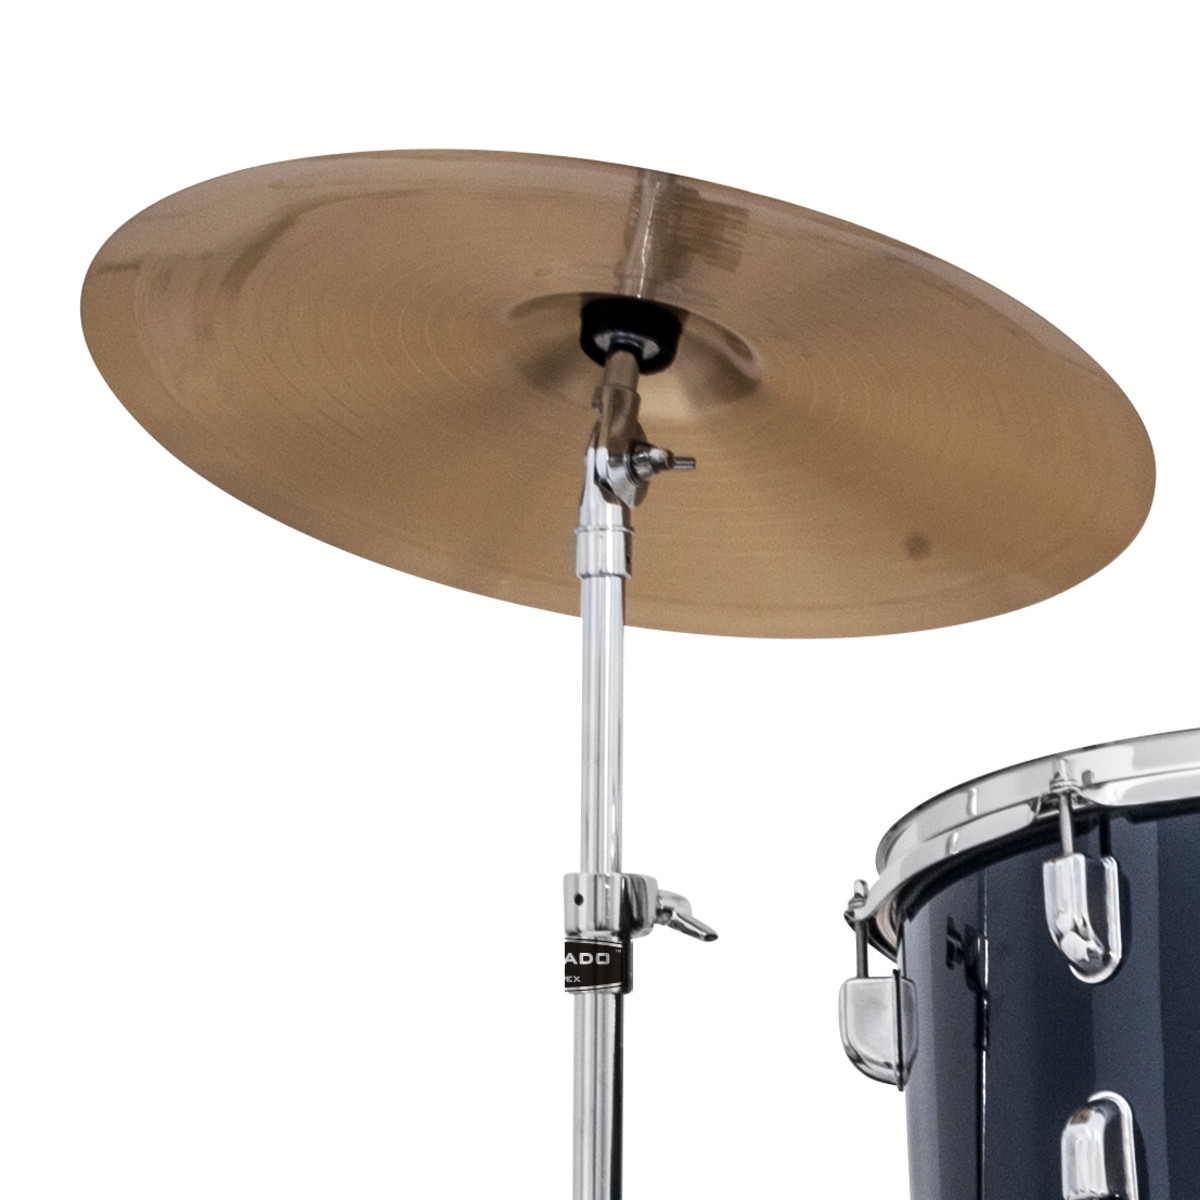 Mapex Tornado Iii Compact 18 Drum Kit Blue Box Opened